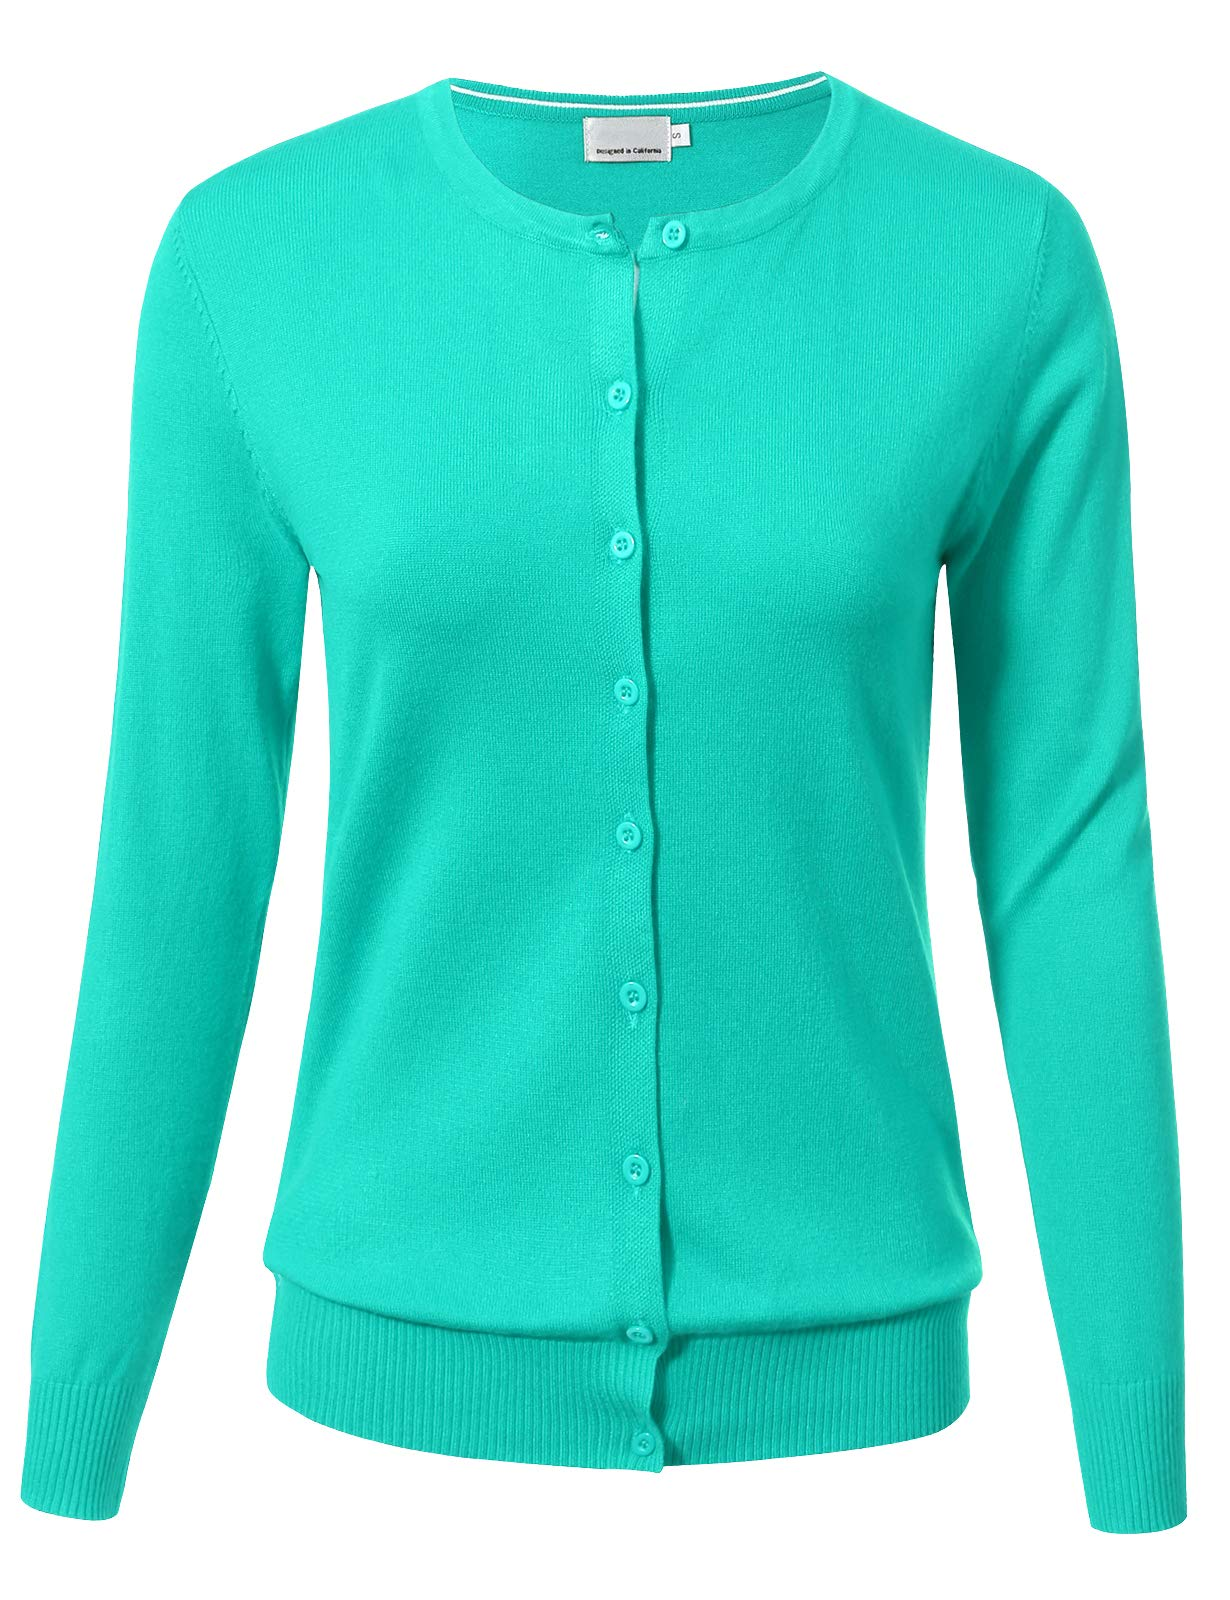 Allsense Women Button Down Long Sleeve Crewneck Soft Knit Cardigan Sweater (S-3XL)